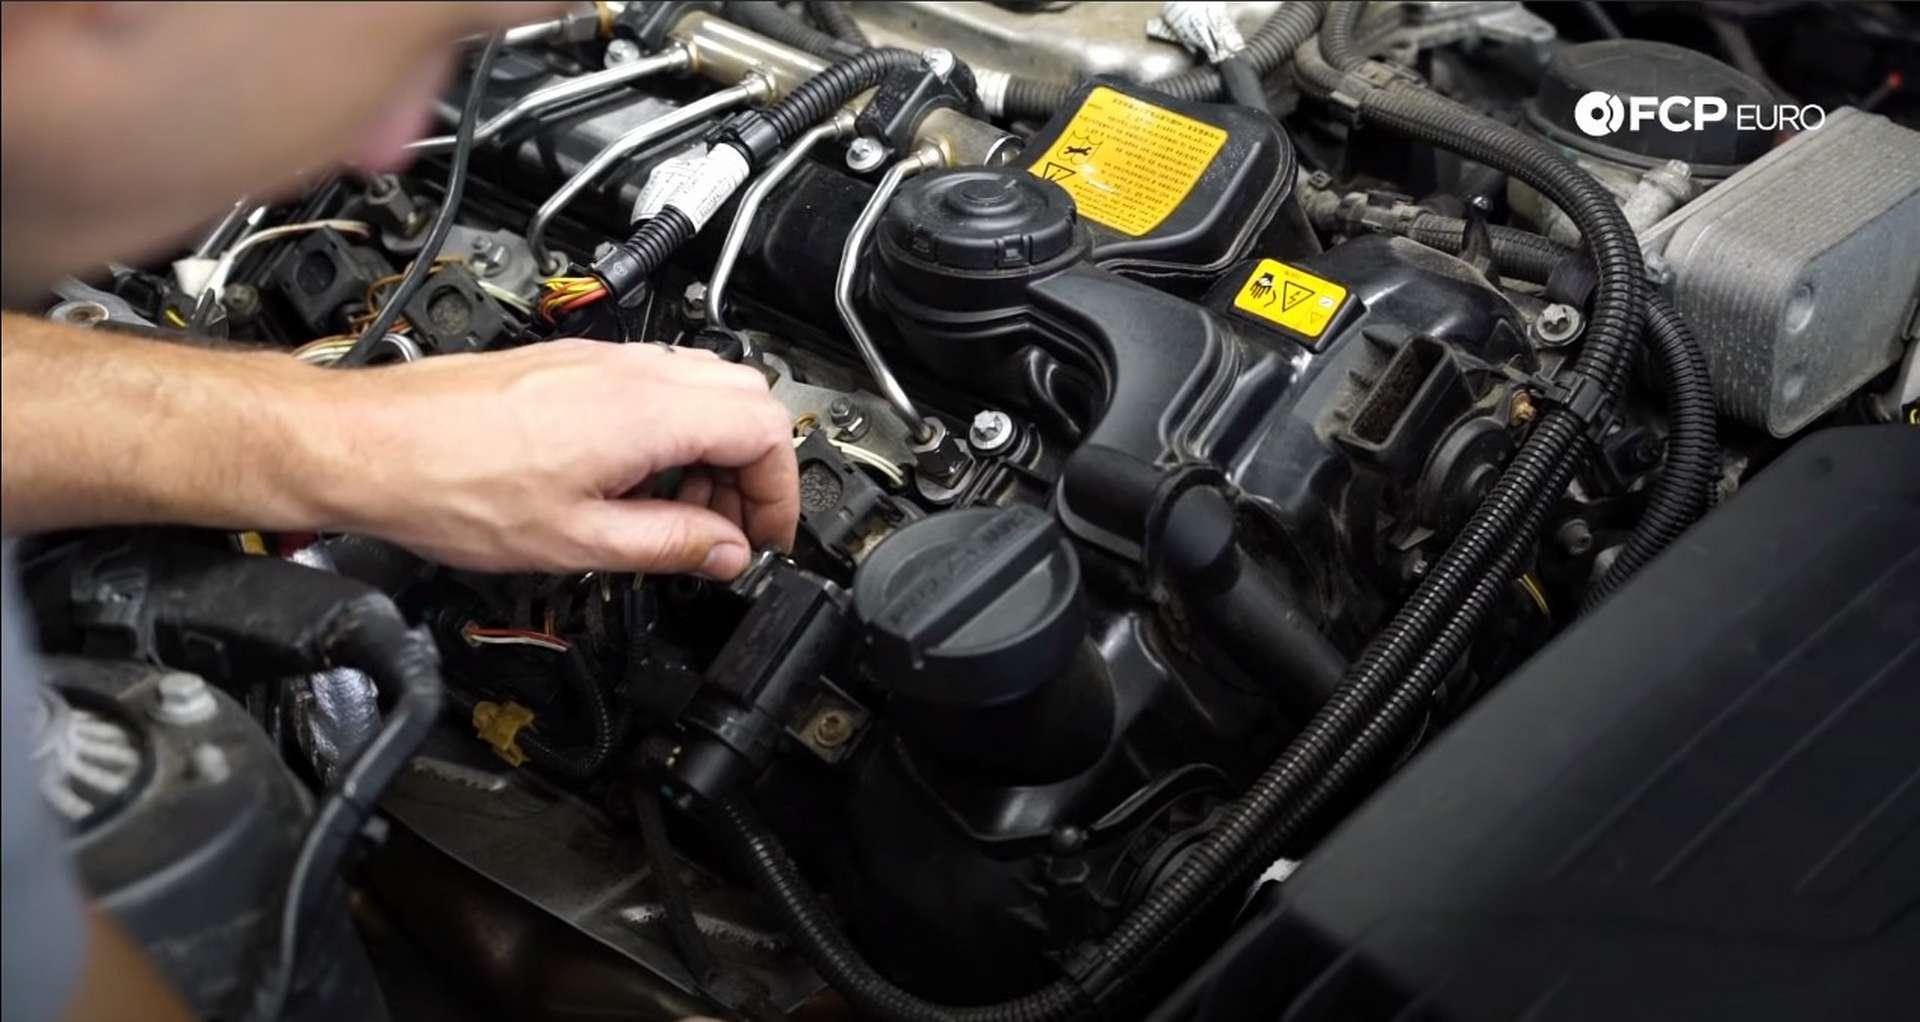 DIY BMW N20 Vacuum Pump unplugging the boost control solenoid